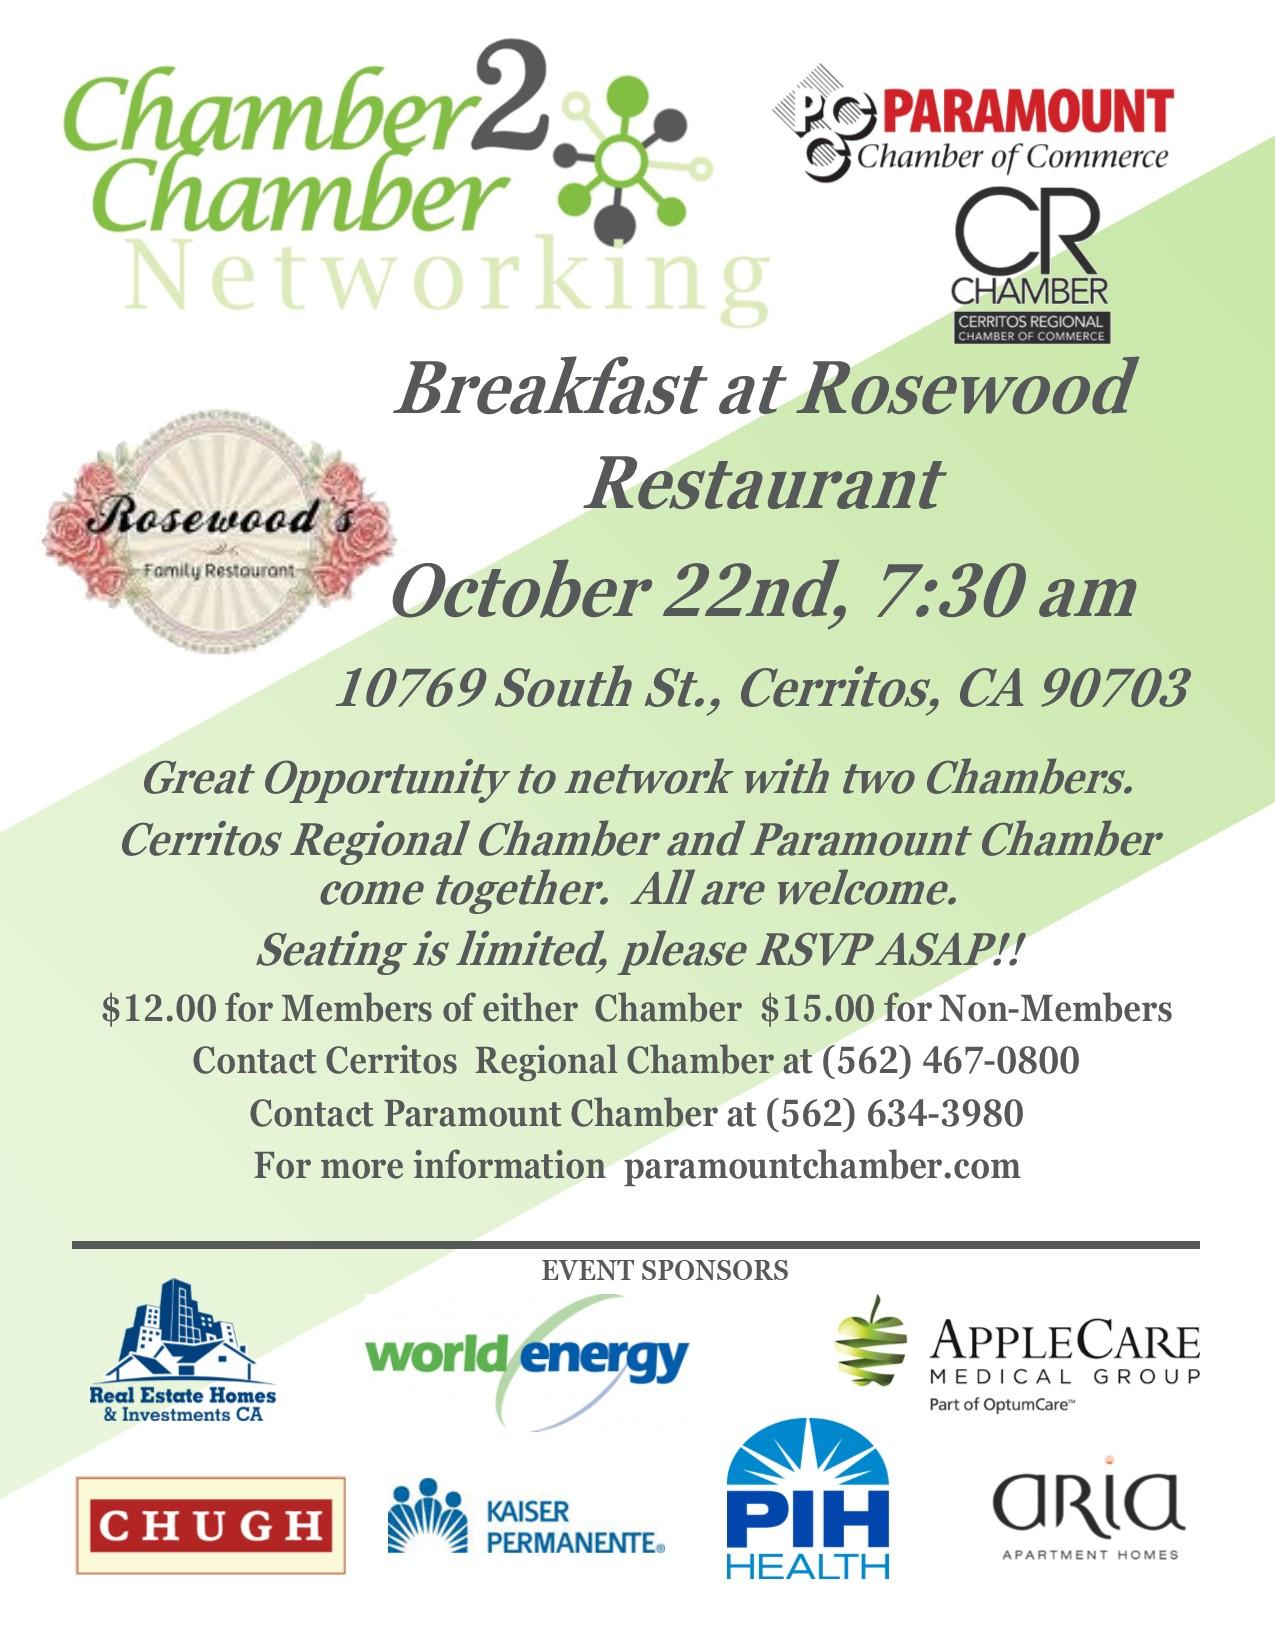 Rosewood Networking Breakfast